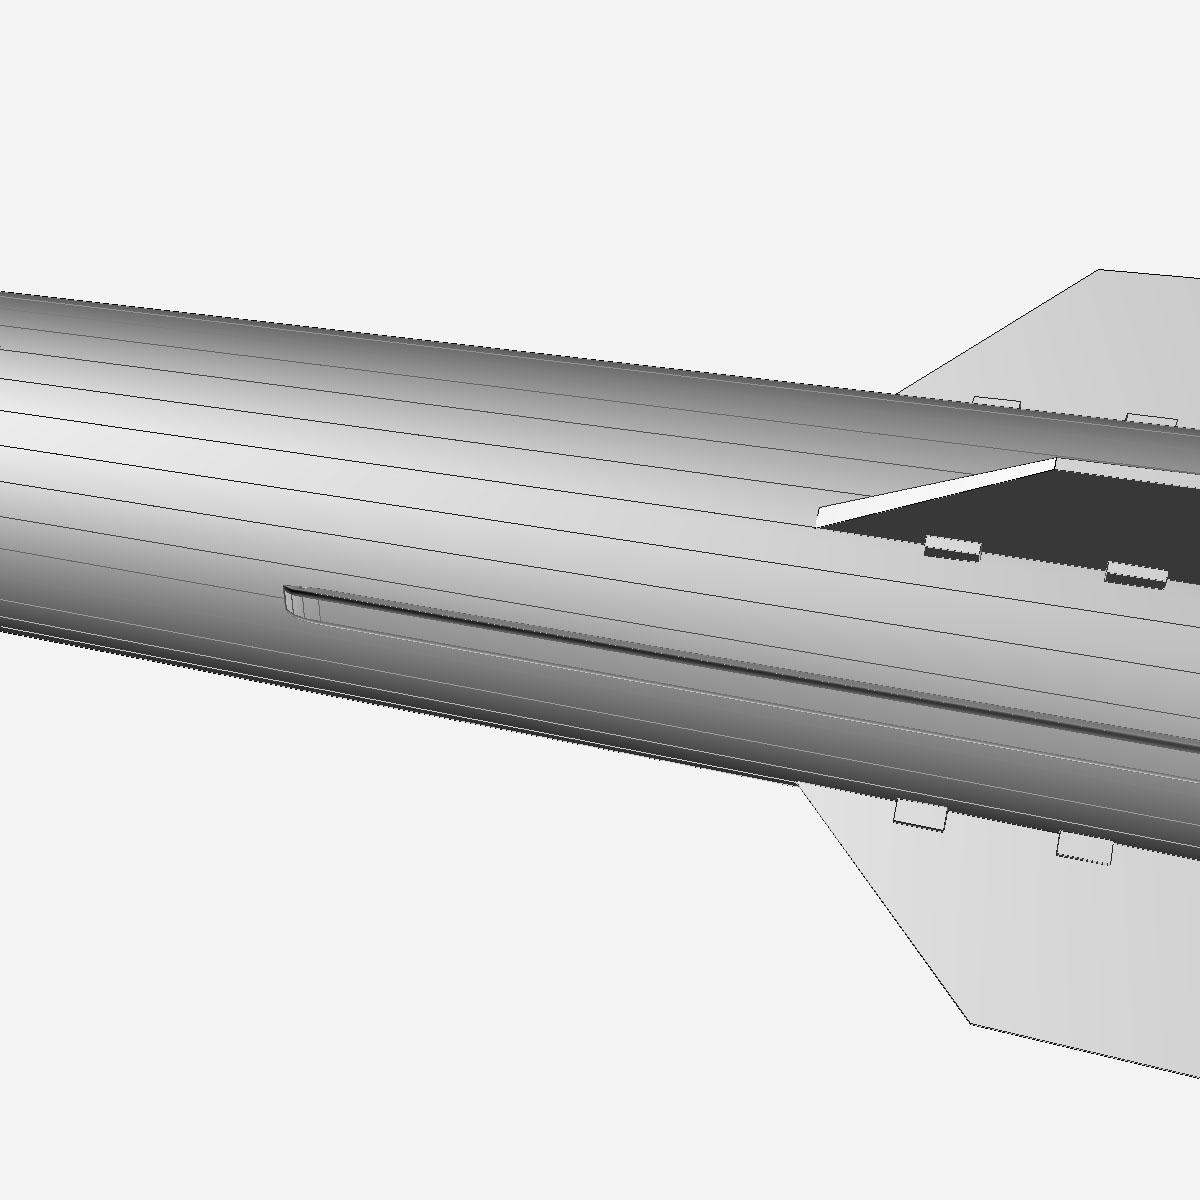 БНХАУ-ын С-400 пуужин 3d загвар 3ds dxf cob x obj 157966